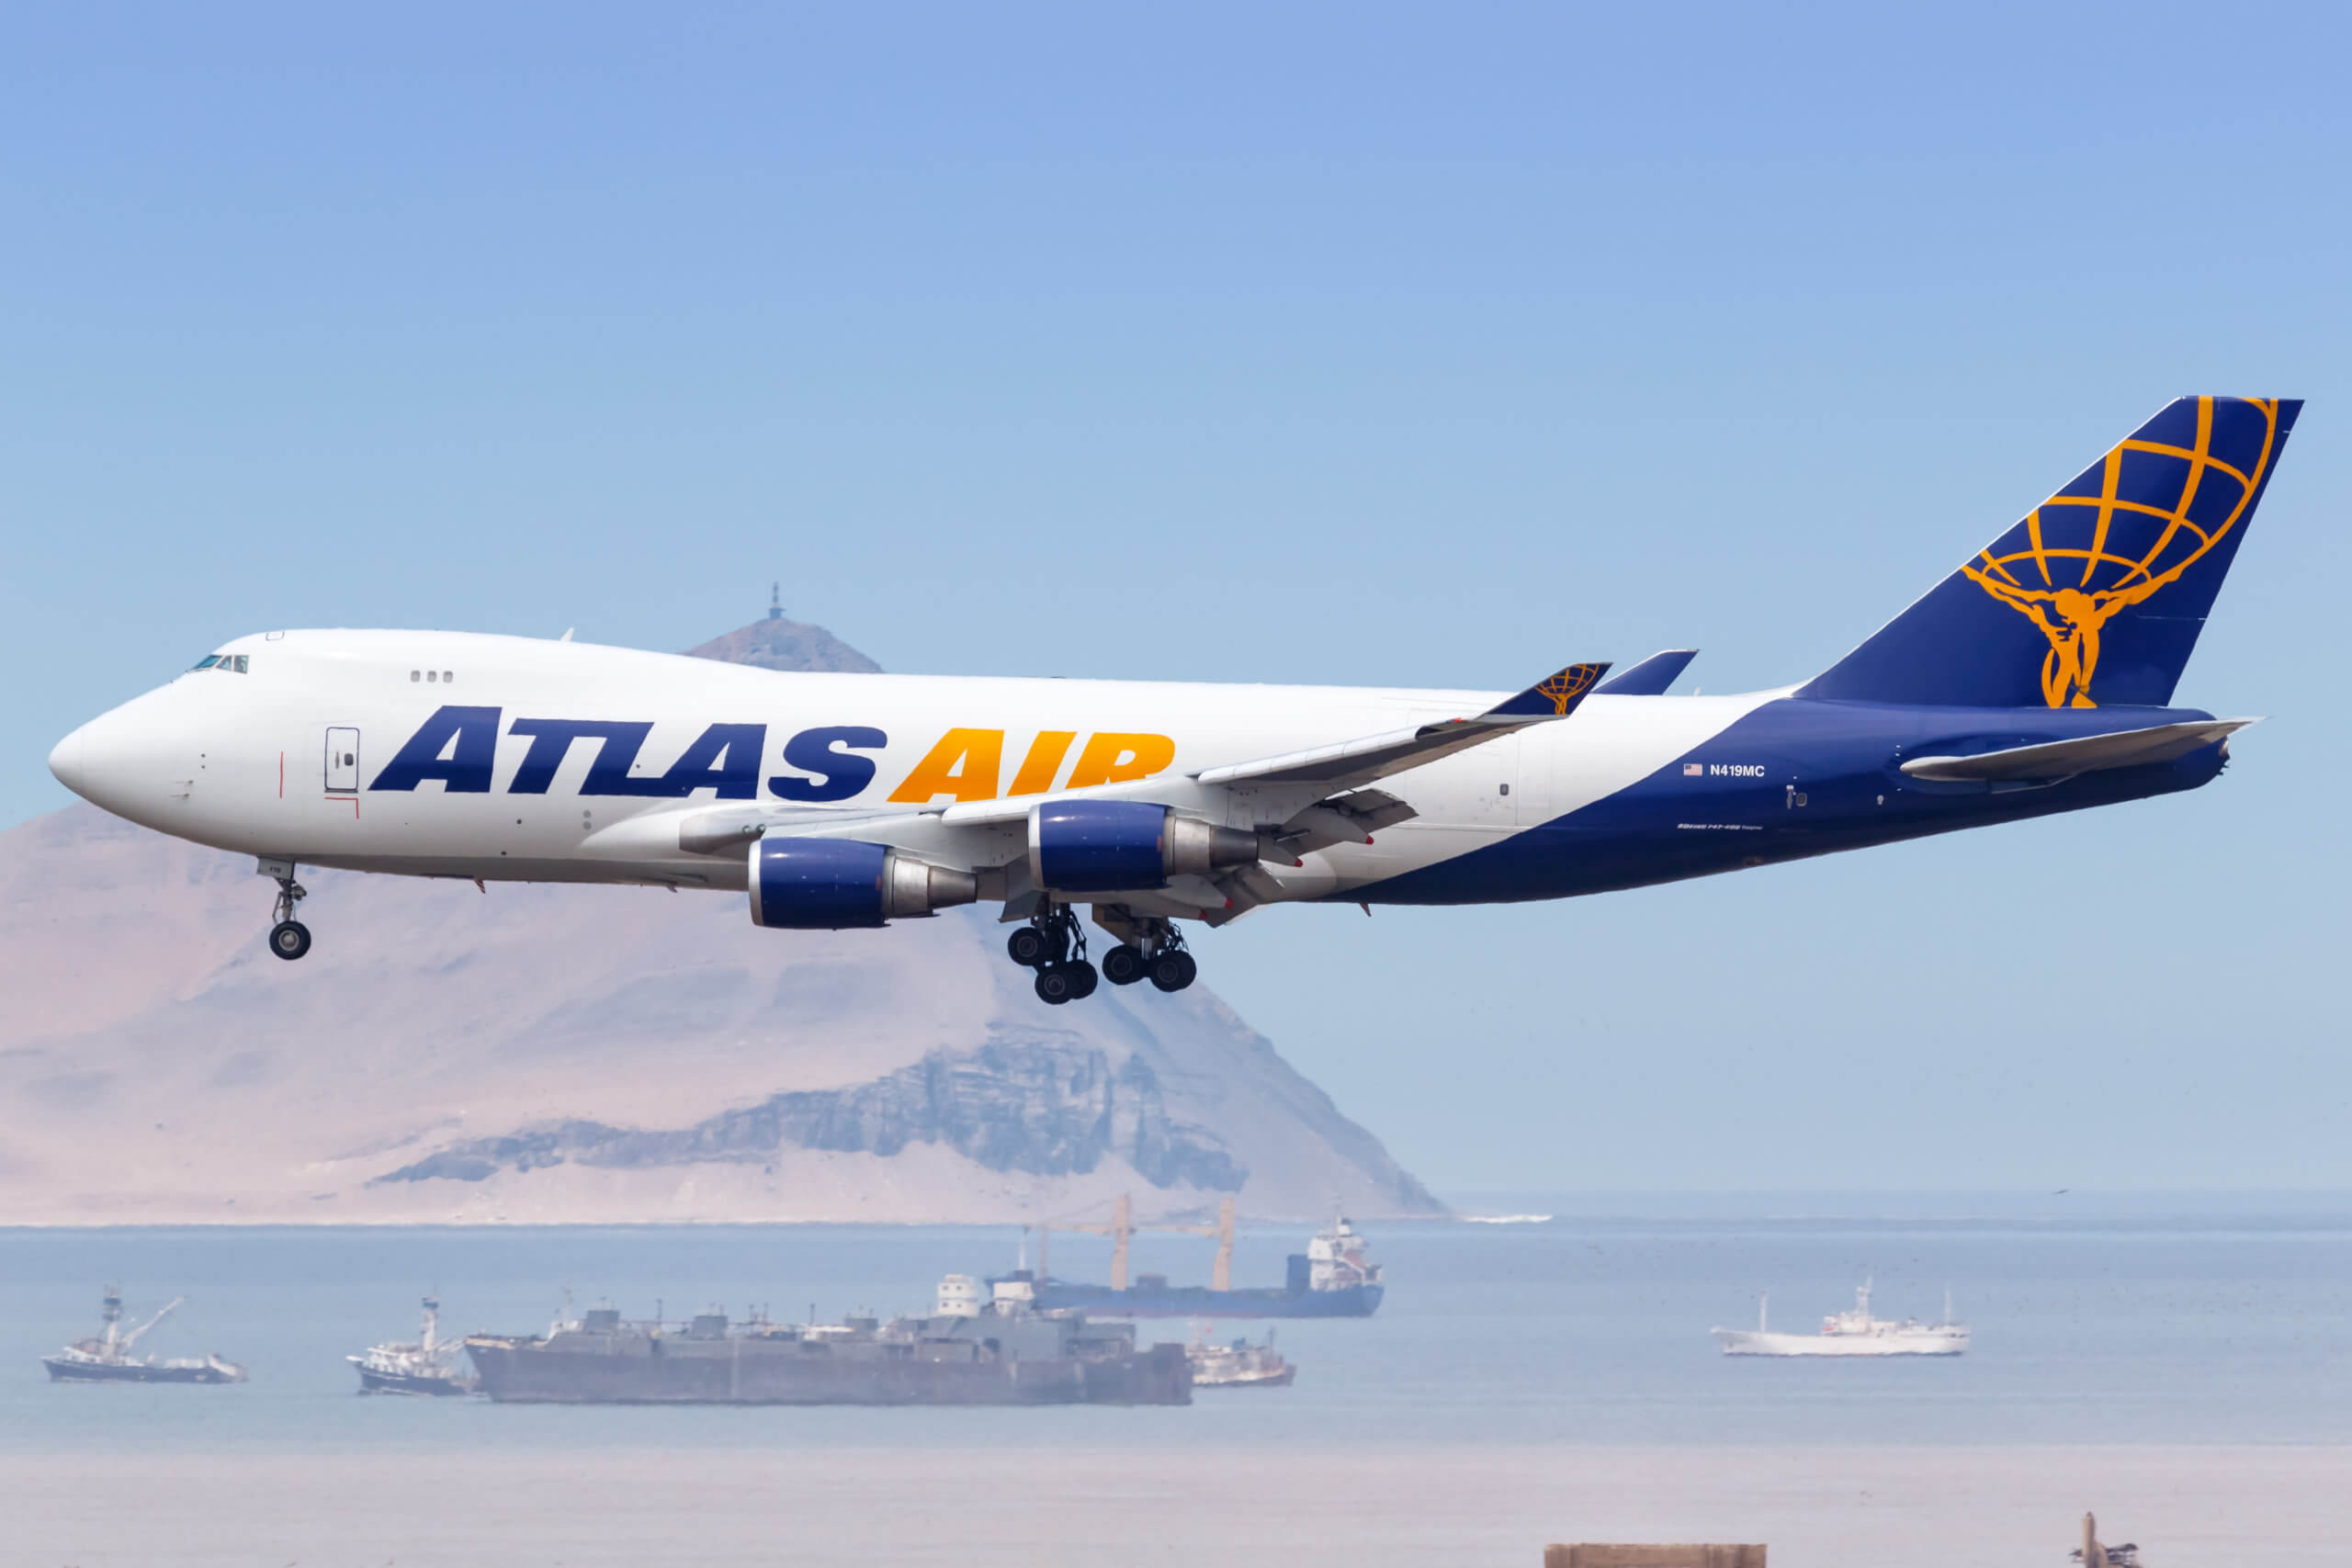 Atlas Air 1